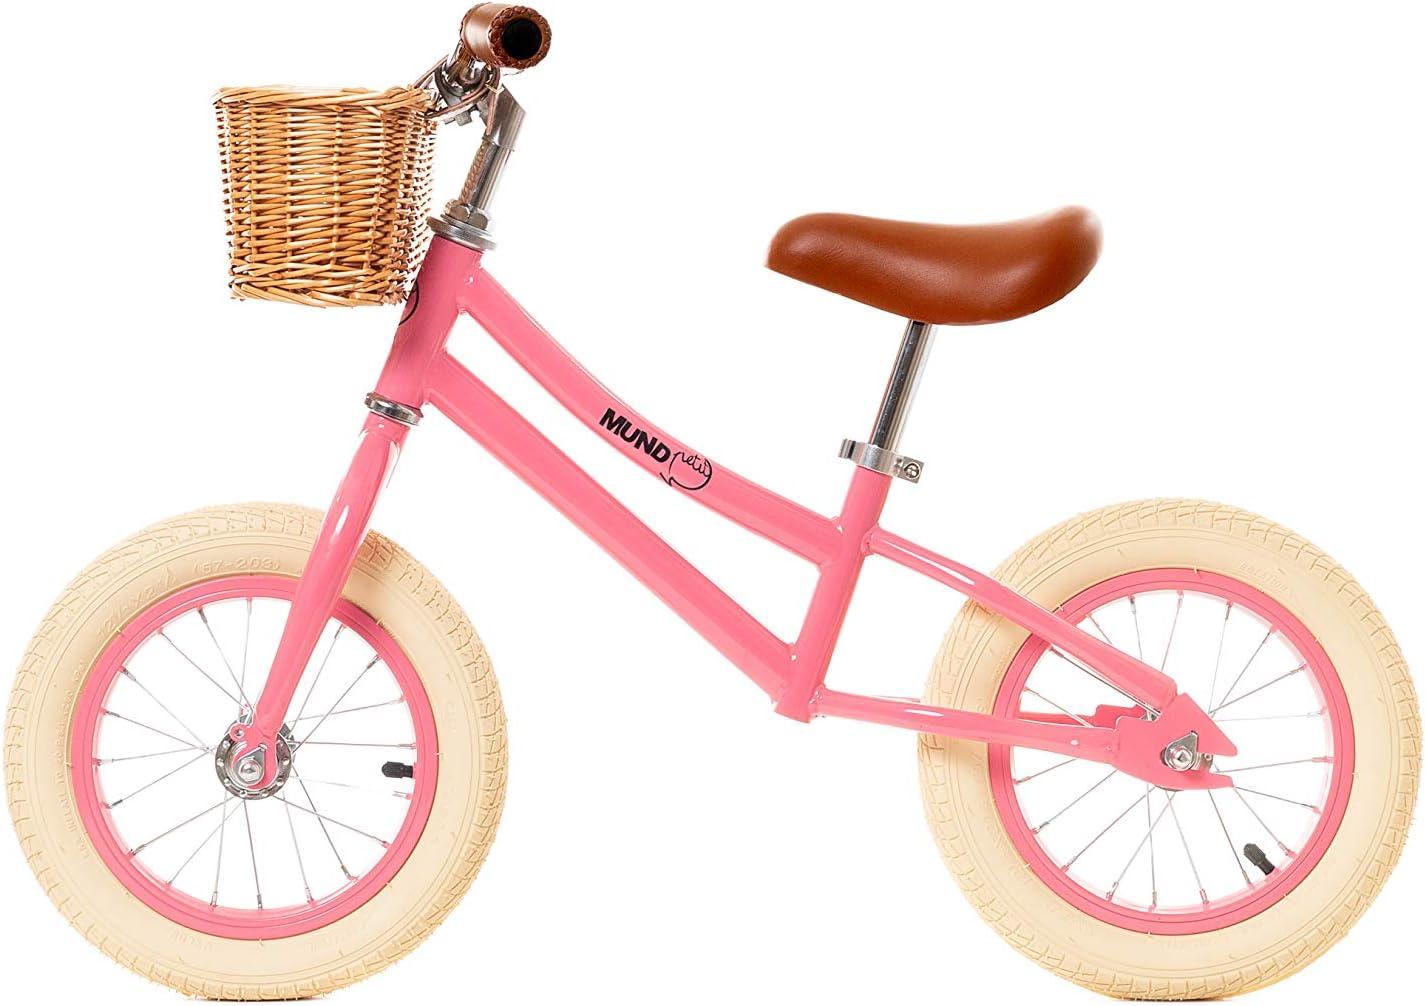 MUNDO PETIT - Bicicleta Sin Pedales - Bicicleta Niño - Bicicleta Aprendizaje 12